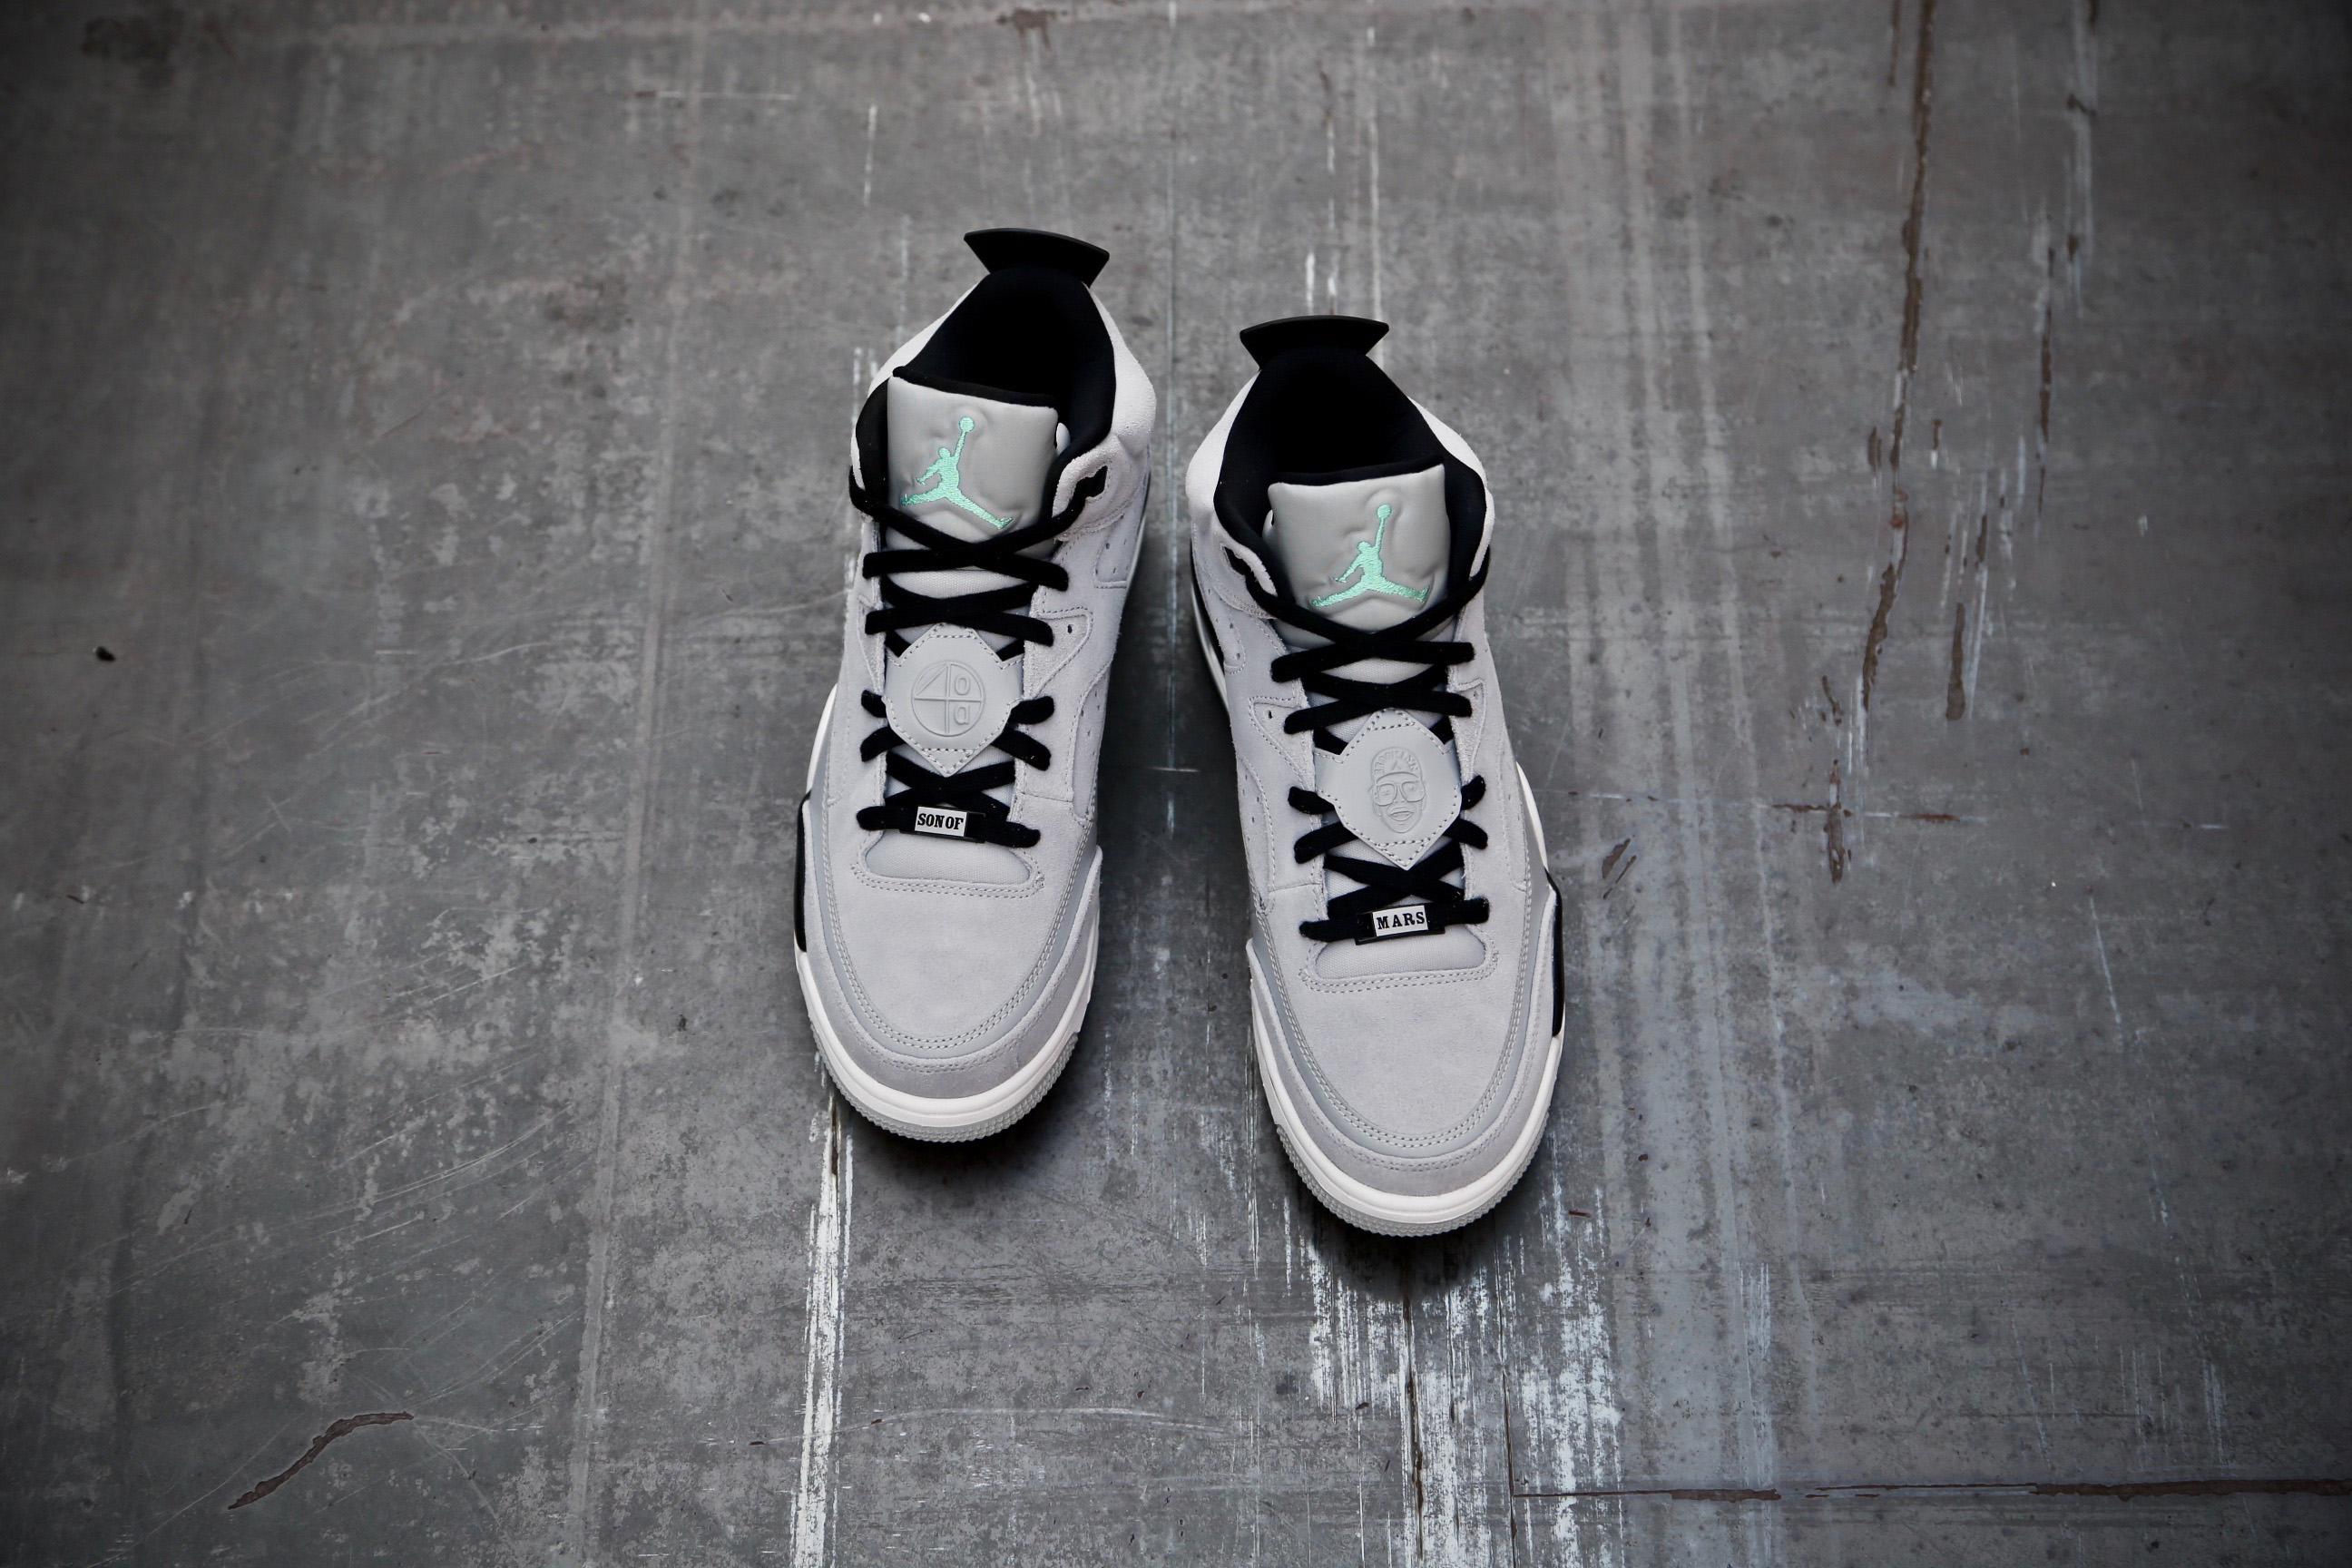 sports shoes 0be9f 402e5 B60P0452 2 · B60P0444 · B60P0446 ...